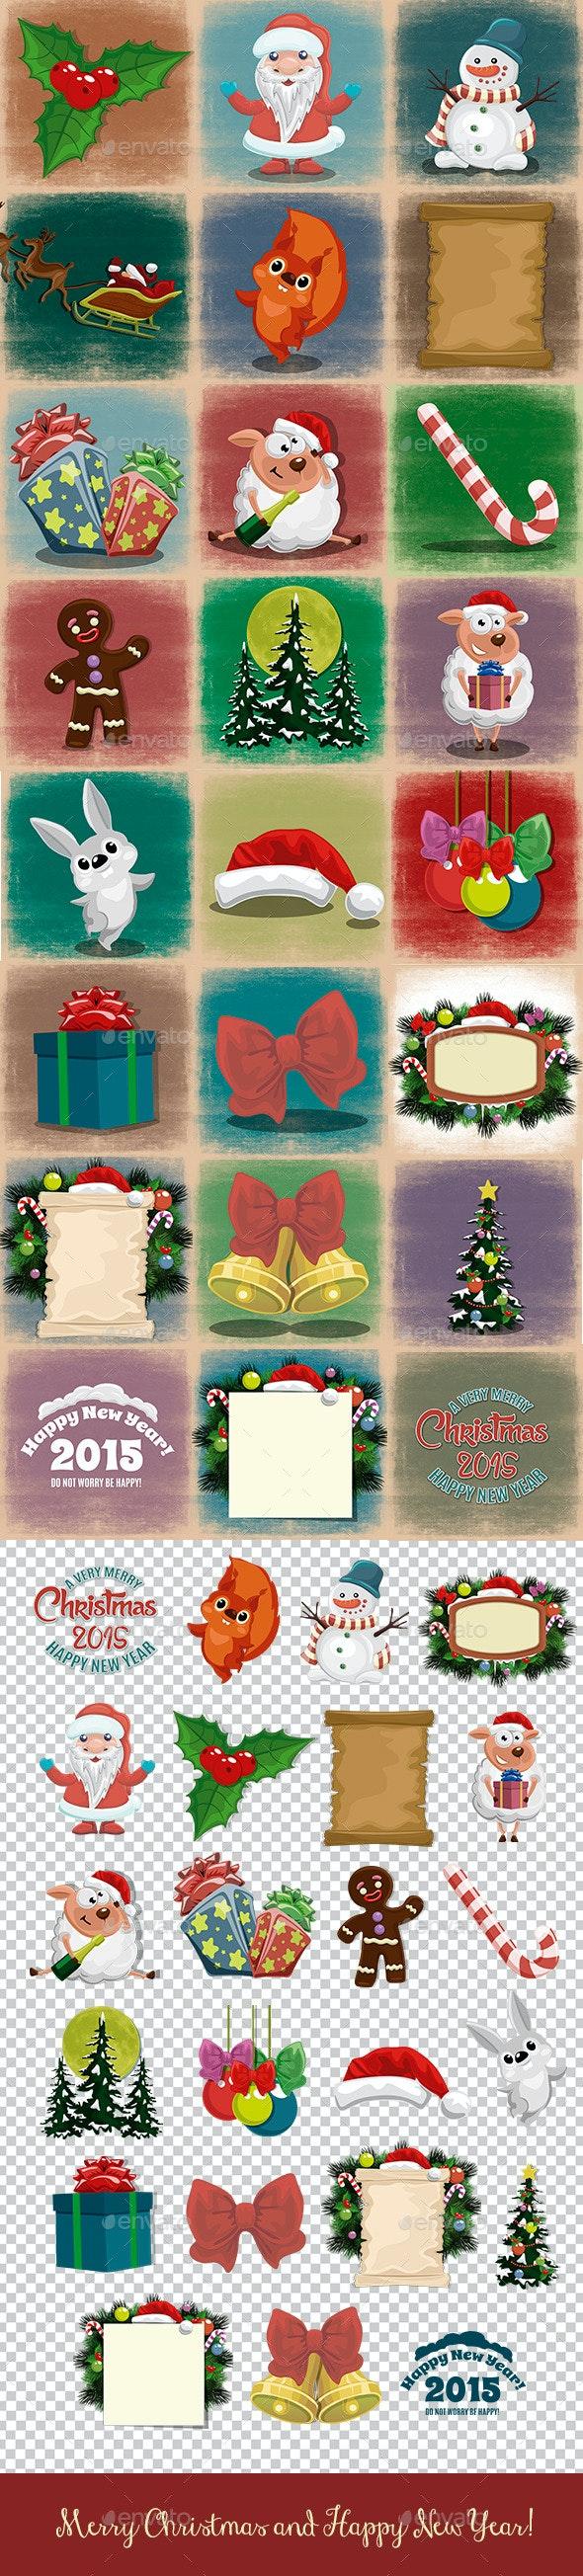 Set Of Christmas Illustrations